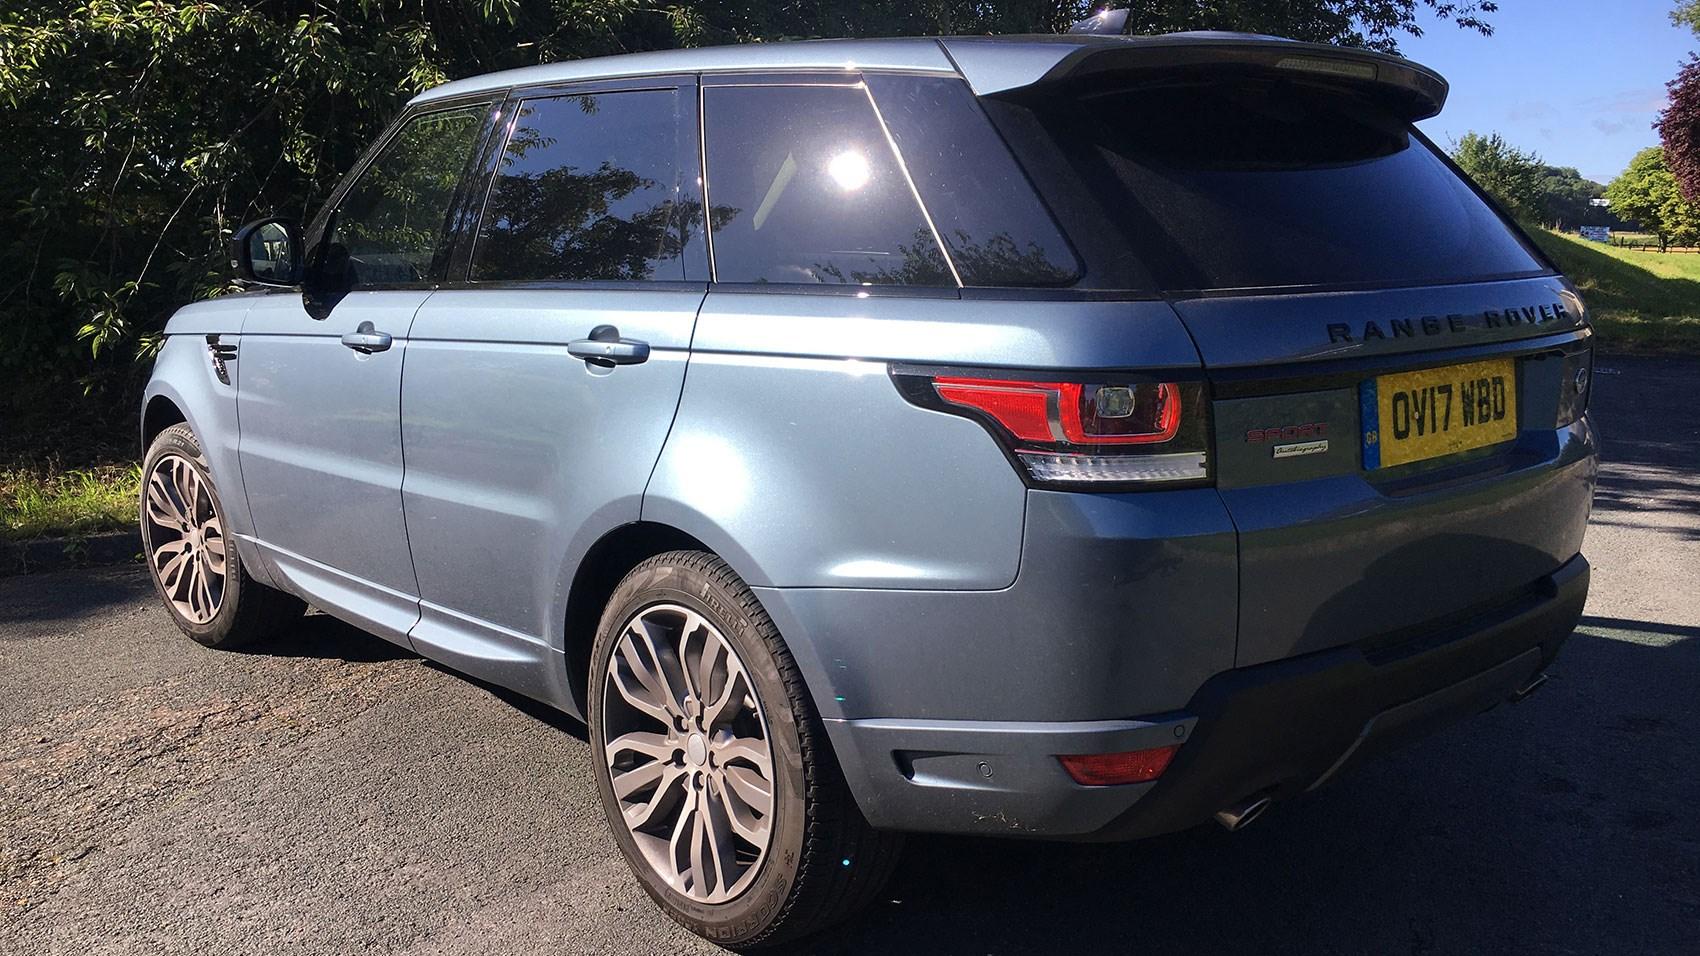 Range Rover Sport SDV7 2017 model year rear view